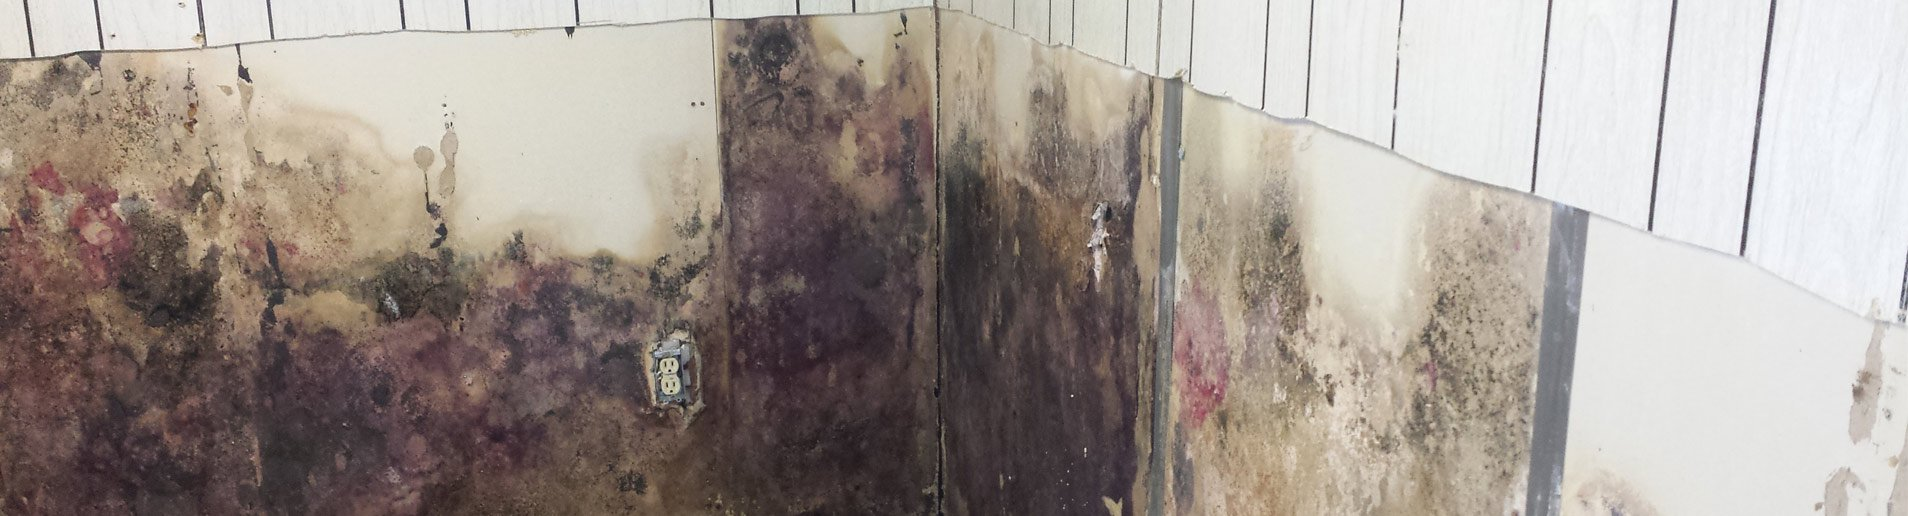 waterproofing structural repair experts triad waterproofing rh triadbasementwaterproofing com Basement Waterproofing Sealer Waterproofing Basement Walls